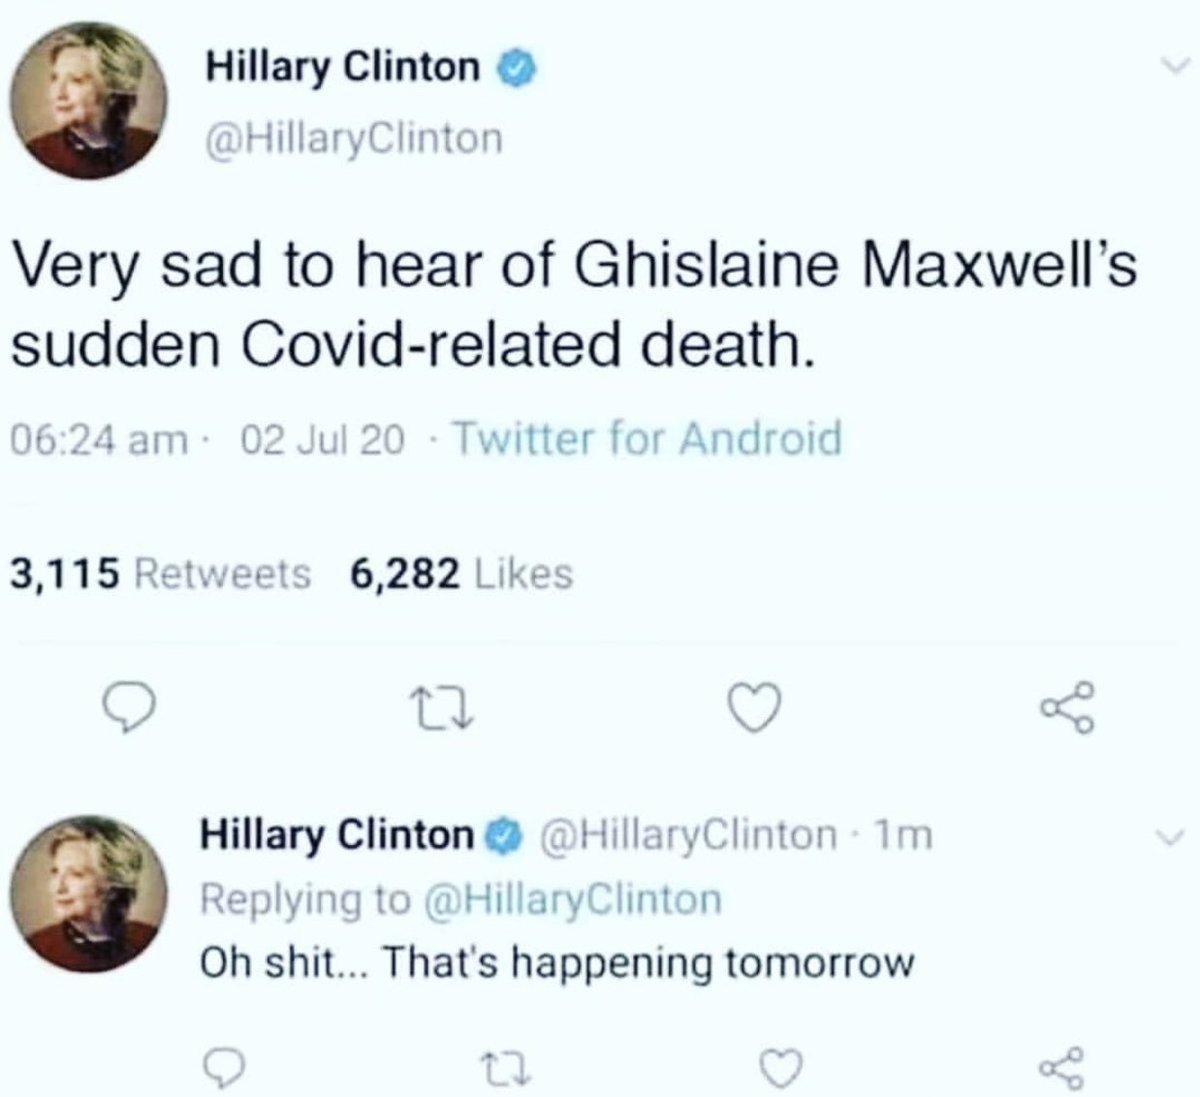 #GhislaineMaxwelldidNOTkillherself